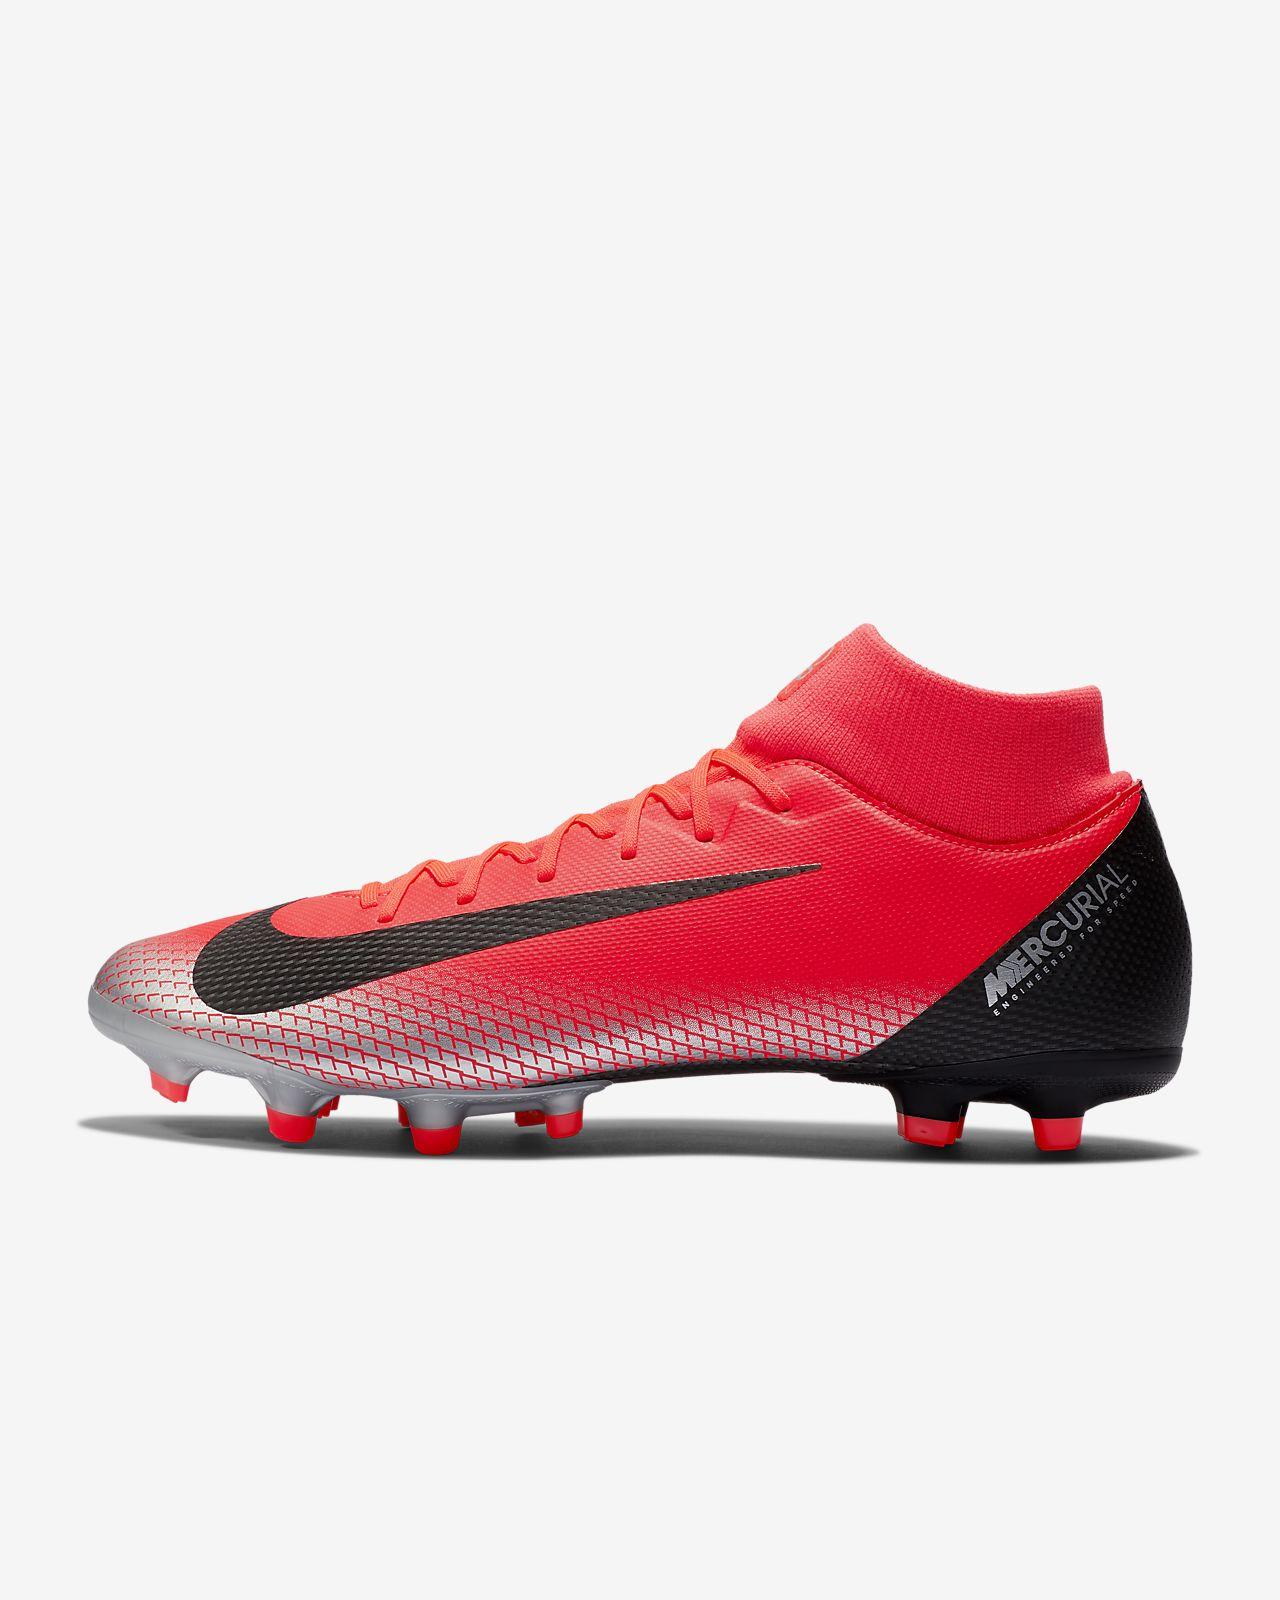 Футбольные бутсы для игры на разных покрытиях Nike Mercurial Superfly 6  Academy CR7 MG 7d979fcff3500